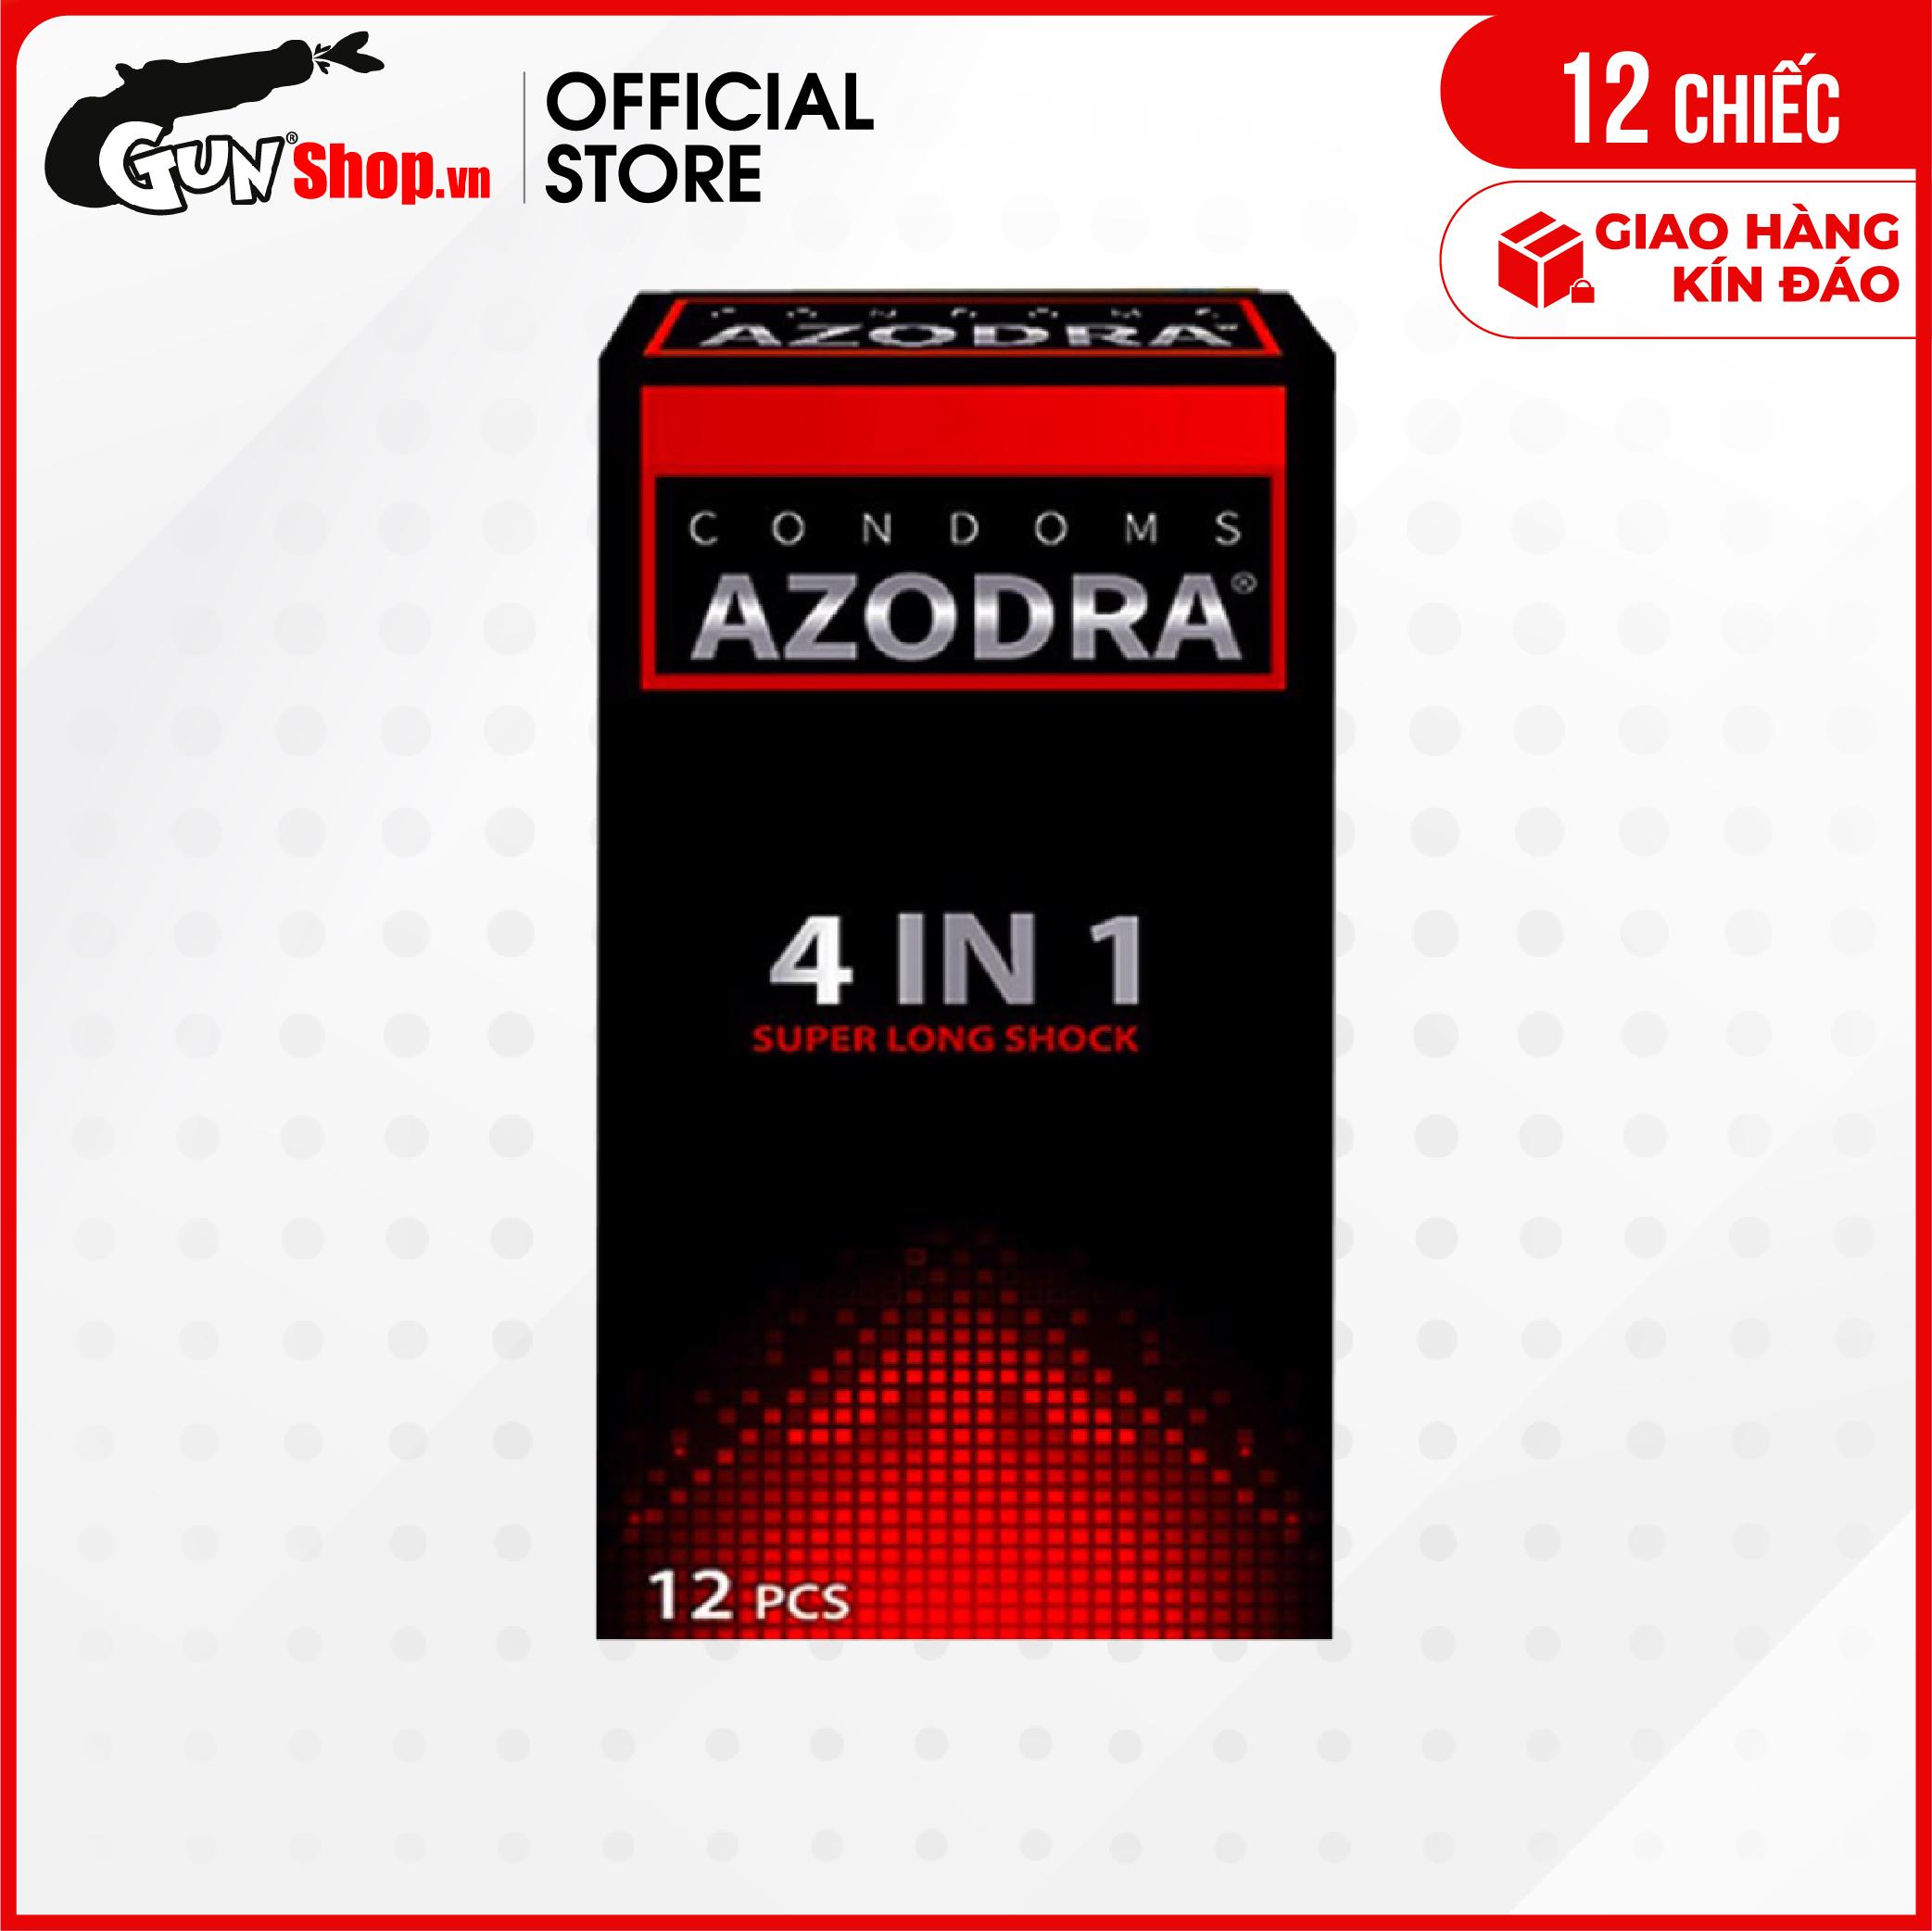 [Hộp 12 cái] Bao cao su Azodra 4 in 1 - Kéo dài thời gian  | GUNSHOP